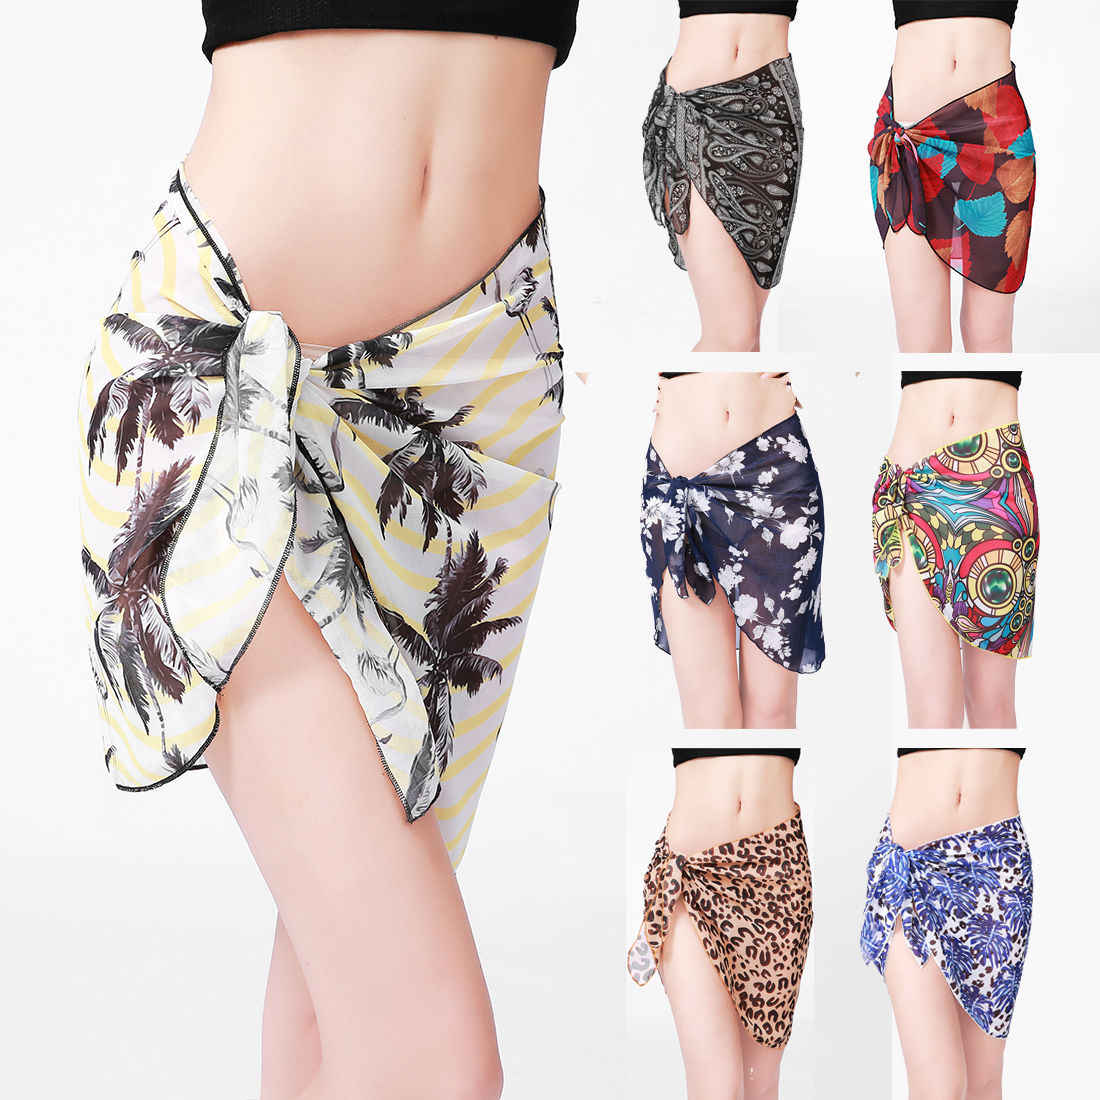 52f7e7d953 ... New Beach Skirt Women Chiffon Short Sarong Bikini Cover Wrap Up Summer  Dress Swimwear Beachwear ...